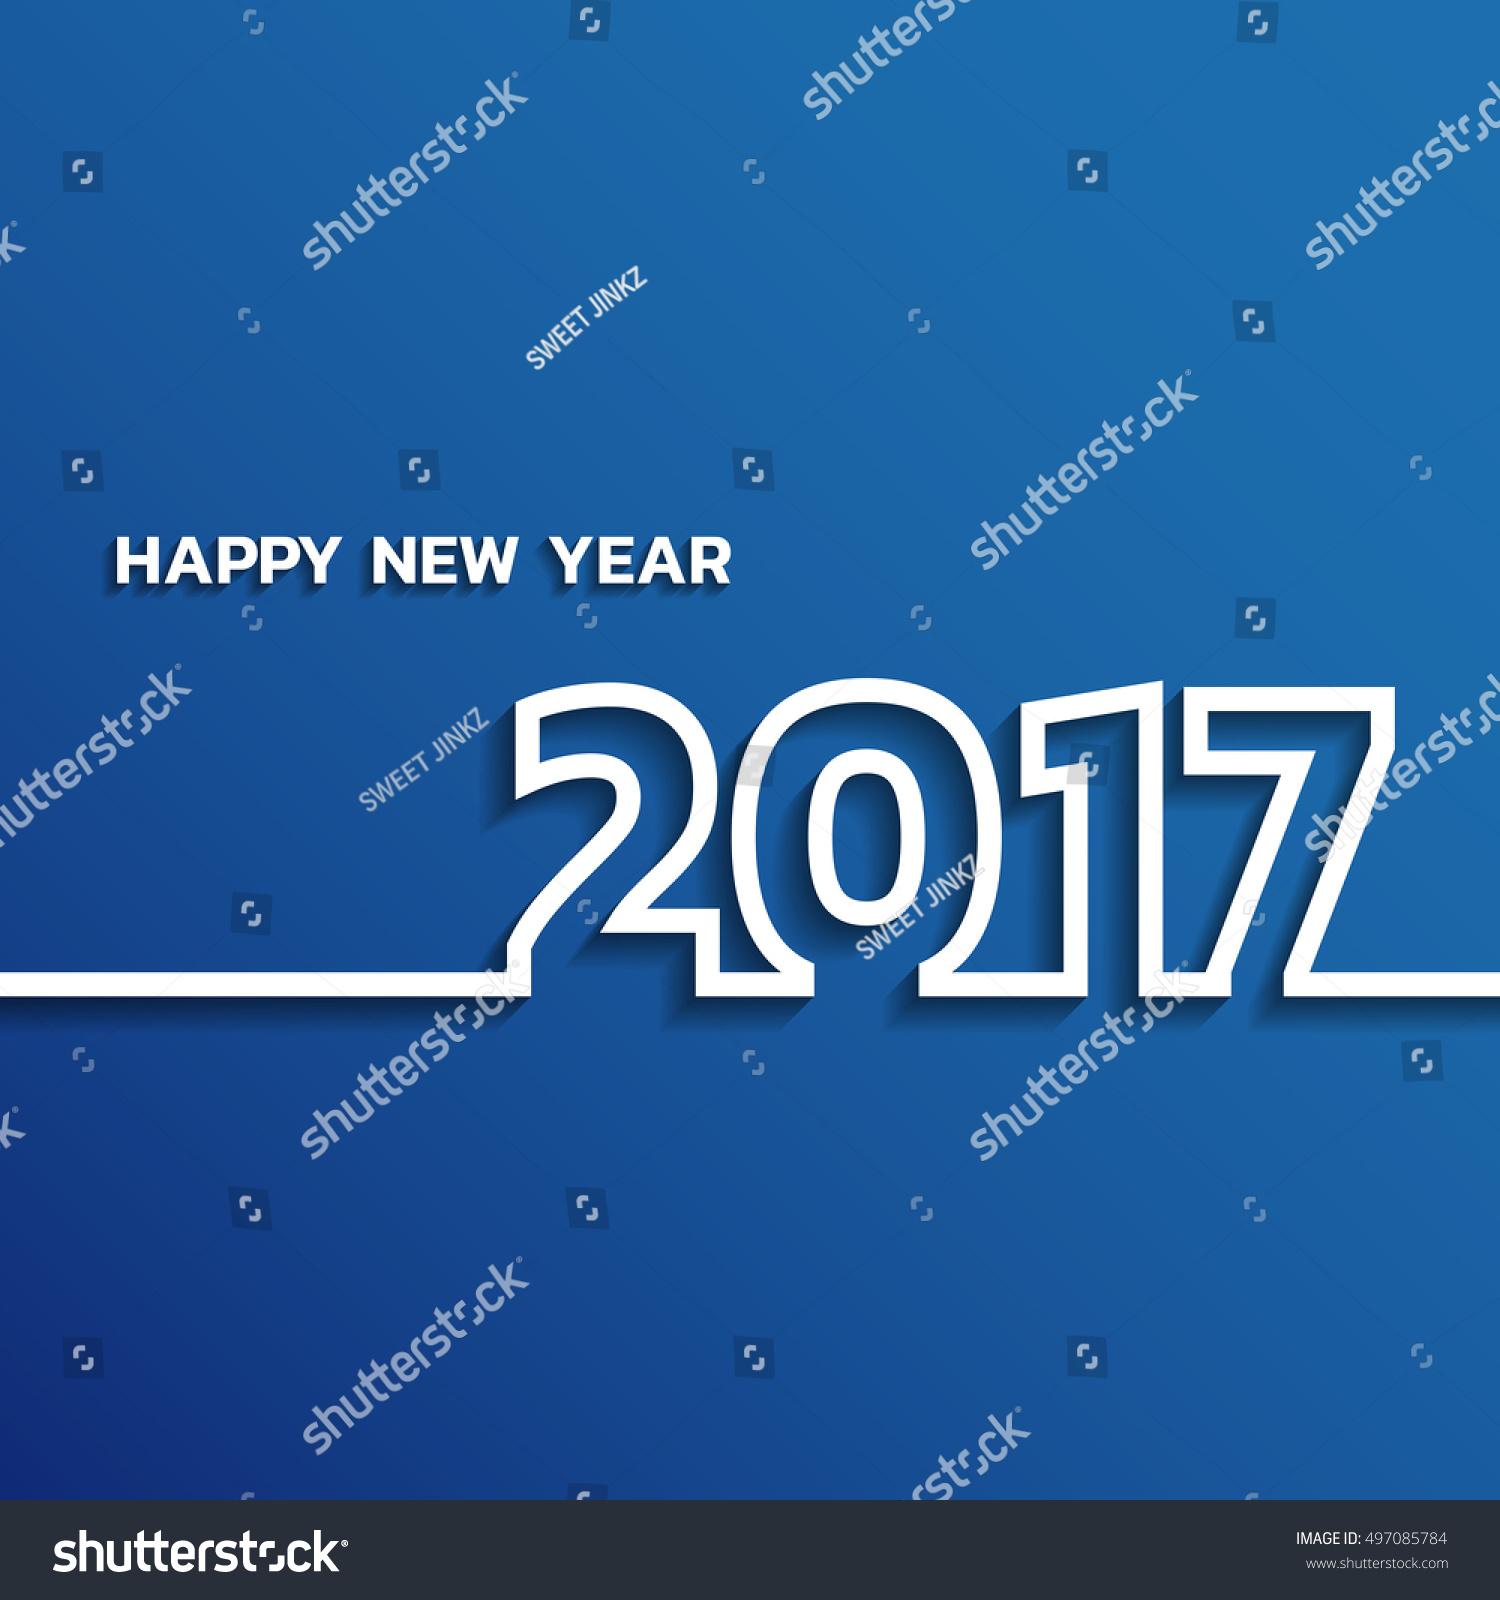 Happy New Year 2017 Vector Background Stock Vector ...